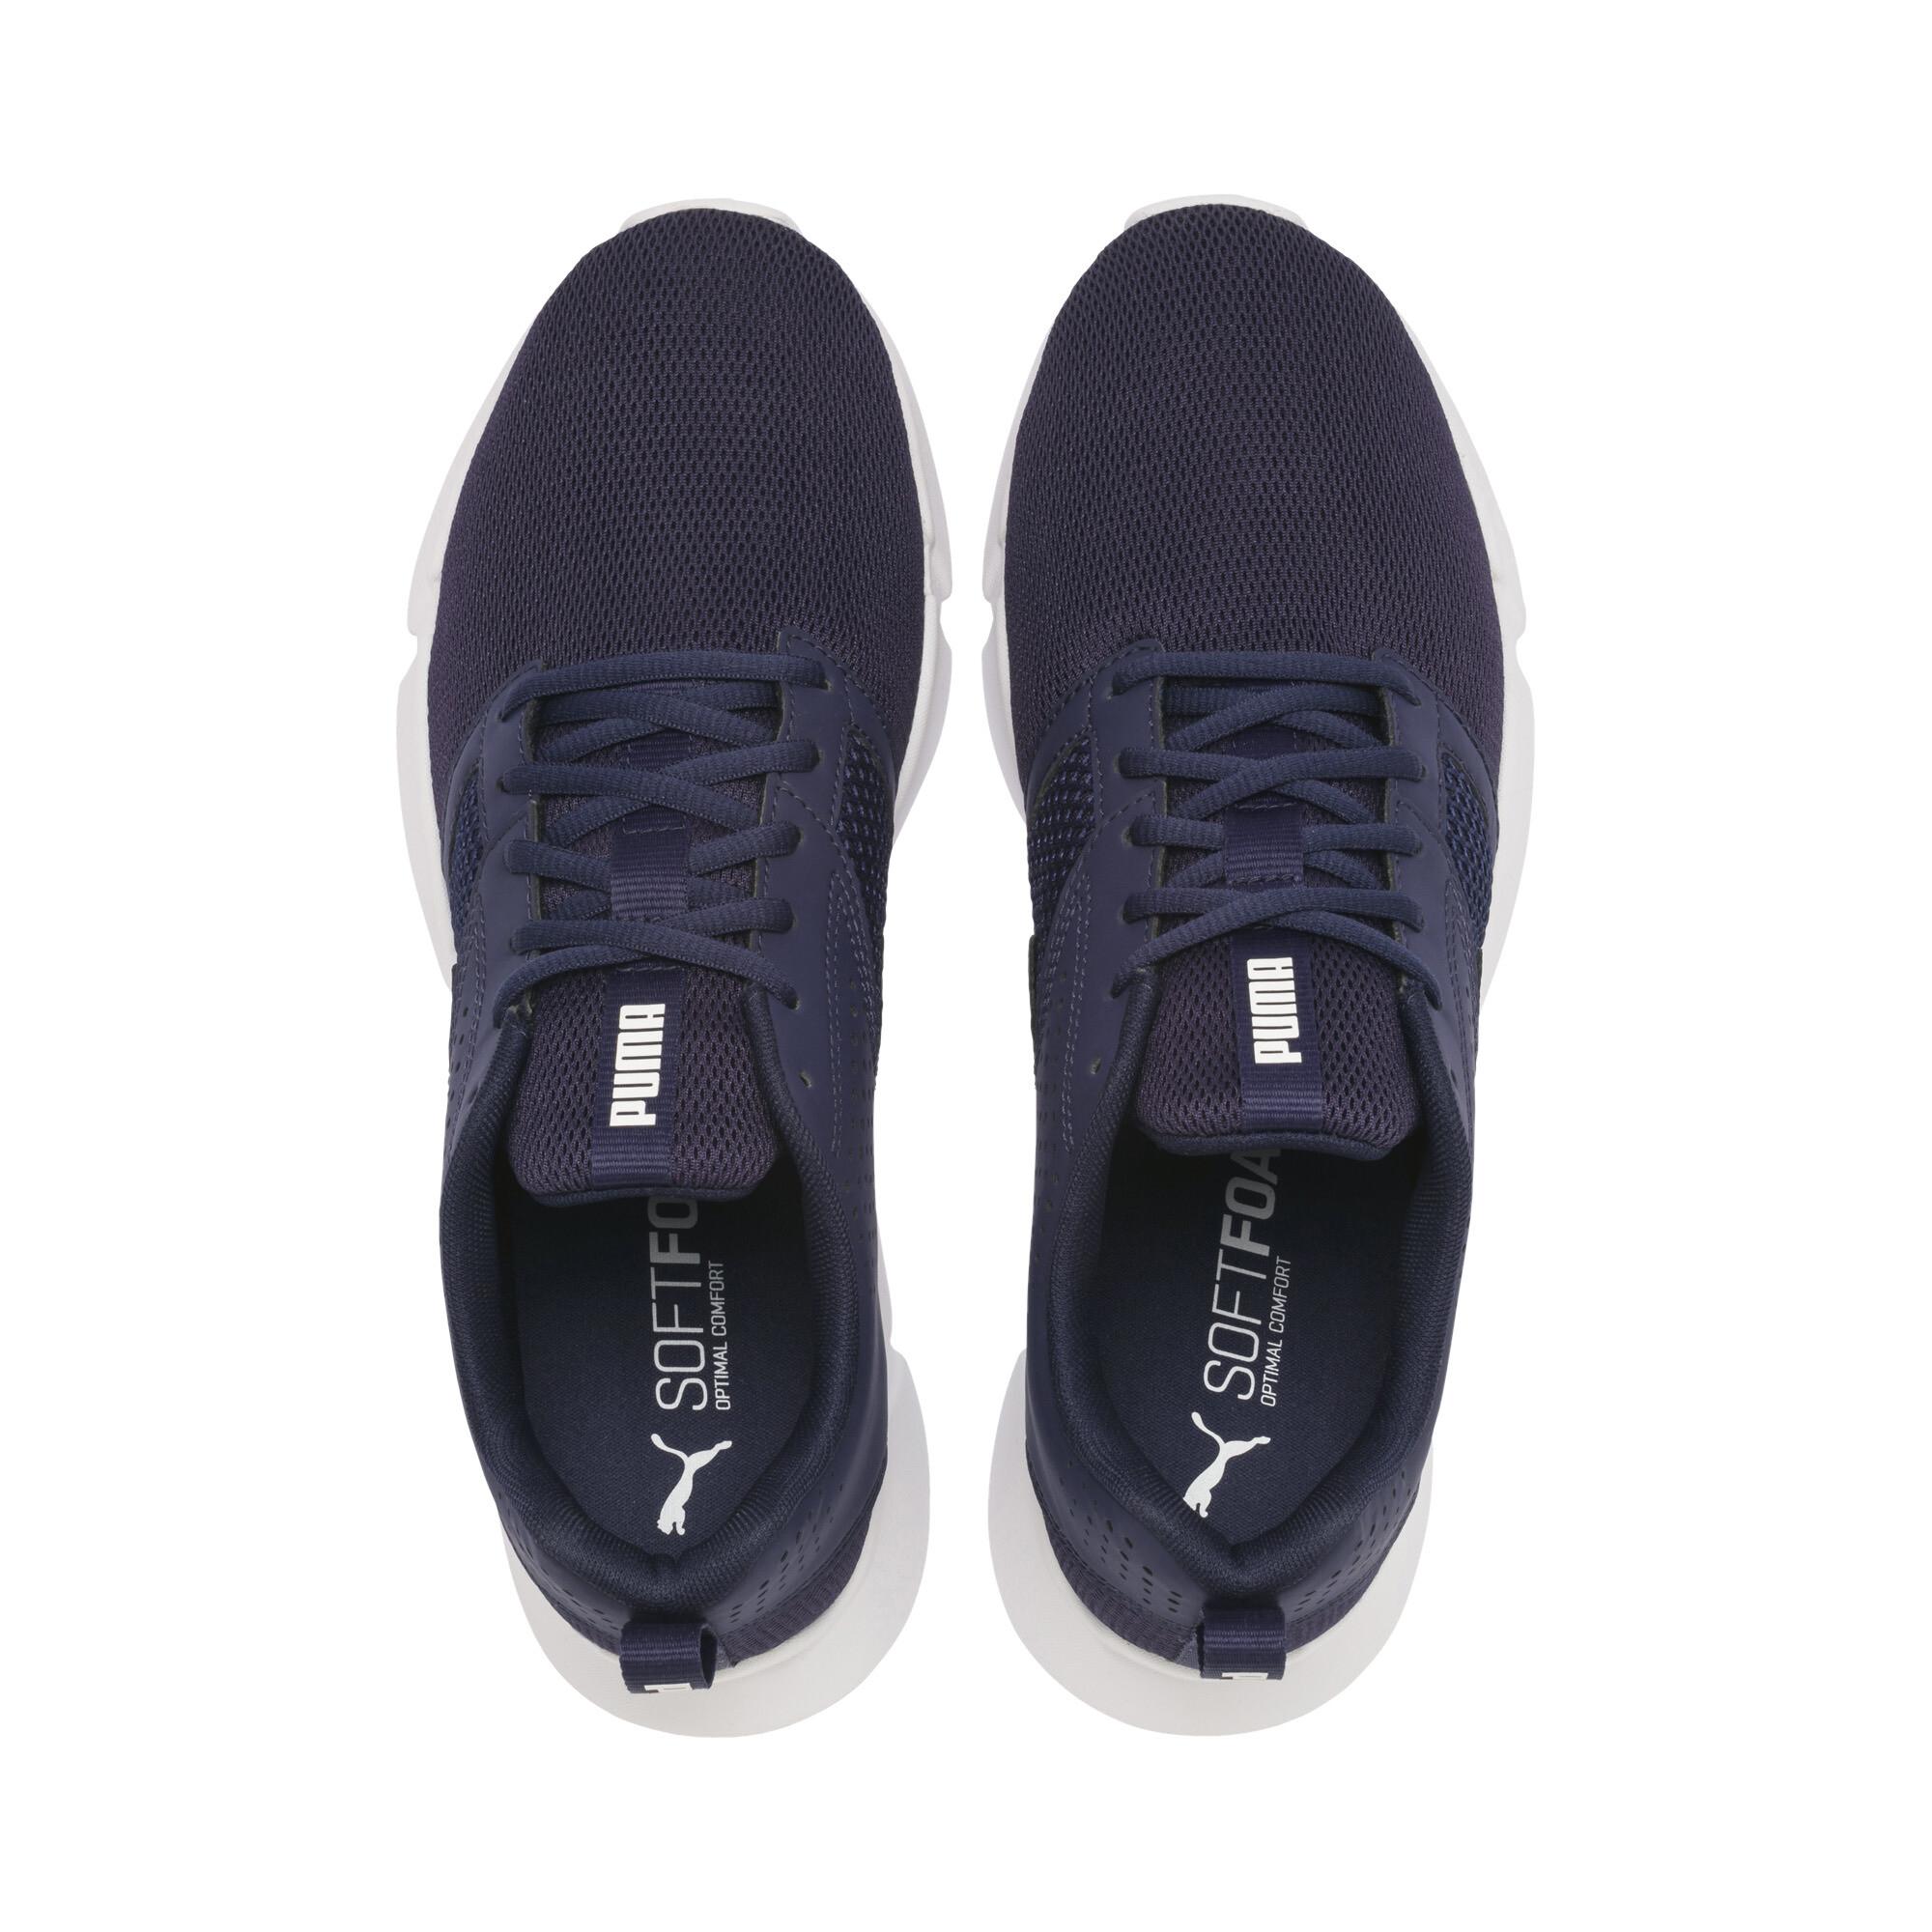 PUMA-INTERFLEX-Modern-Men-039-s-Sneakers-Unisex-Shoe-Running thumbnail 8